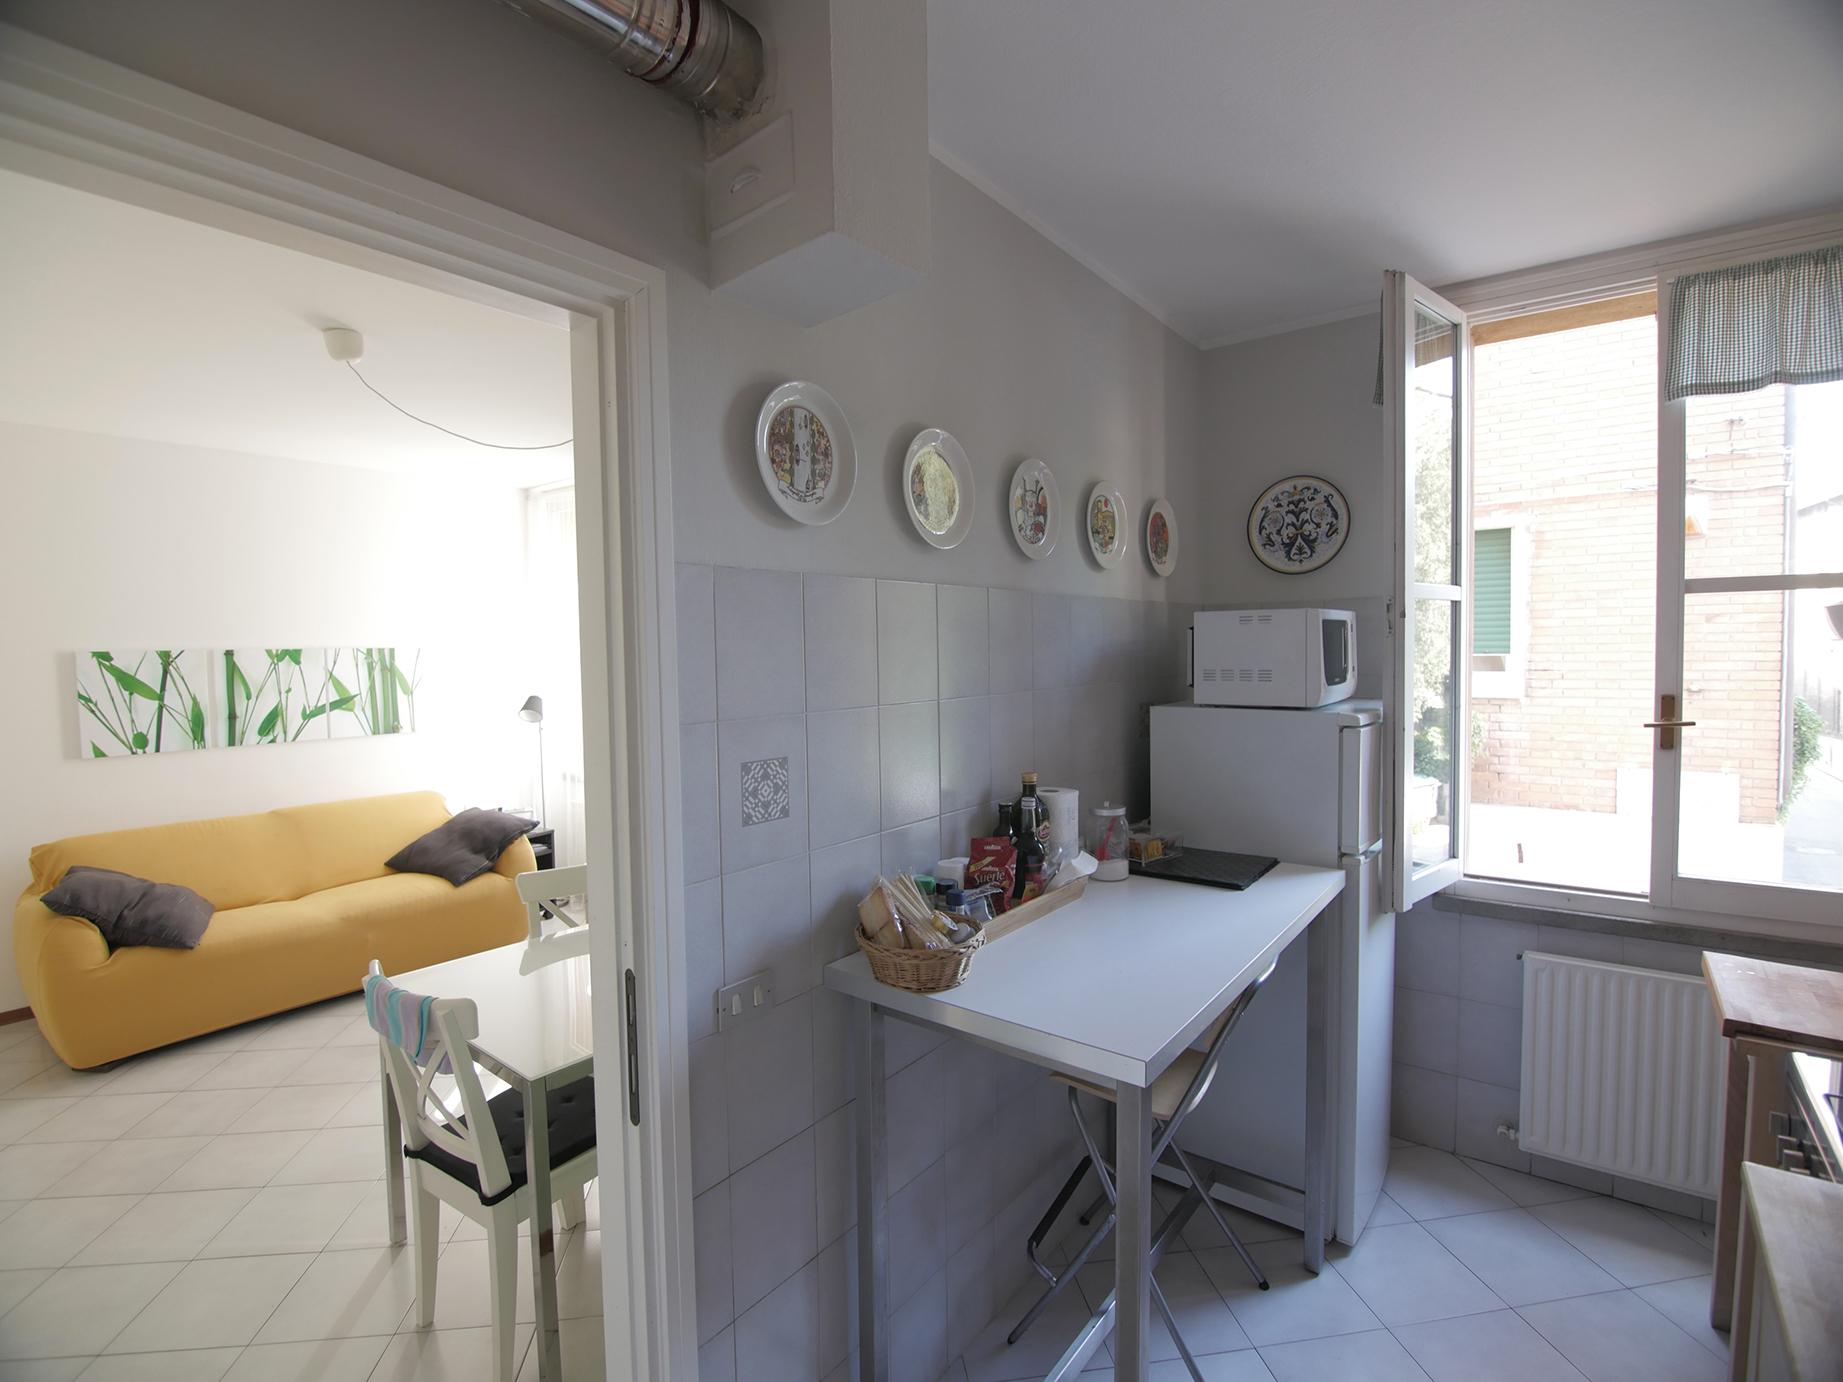 Appartamento Incentro - cucina